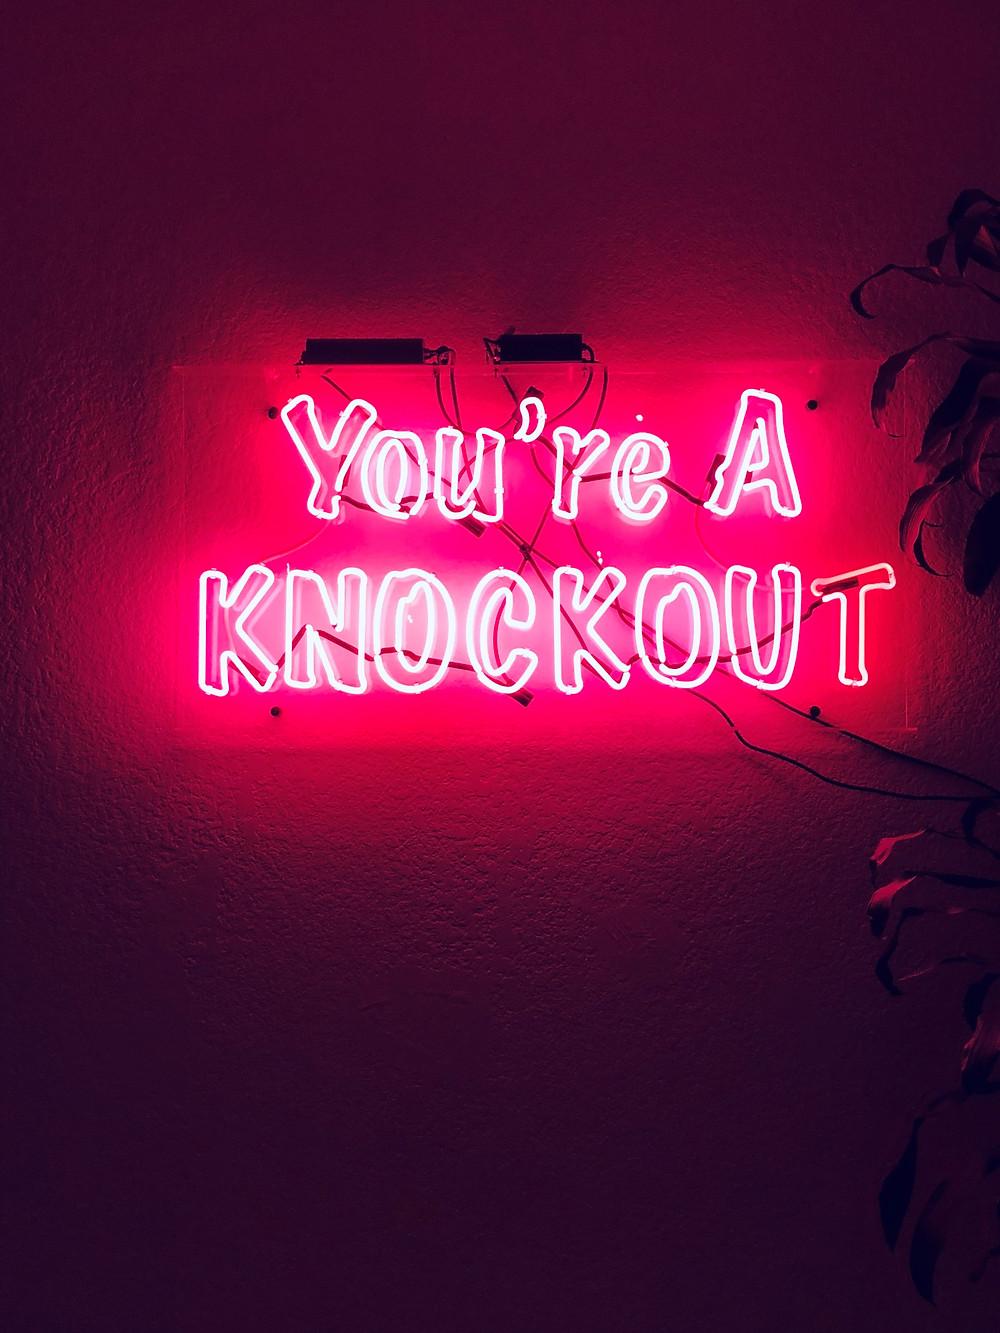 Knockout LA Self Discovery Studio, Los Angeles workout studio,  workout neon sign, neon pink sign